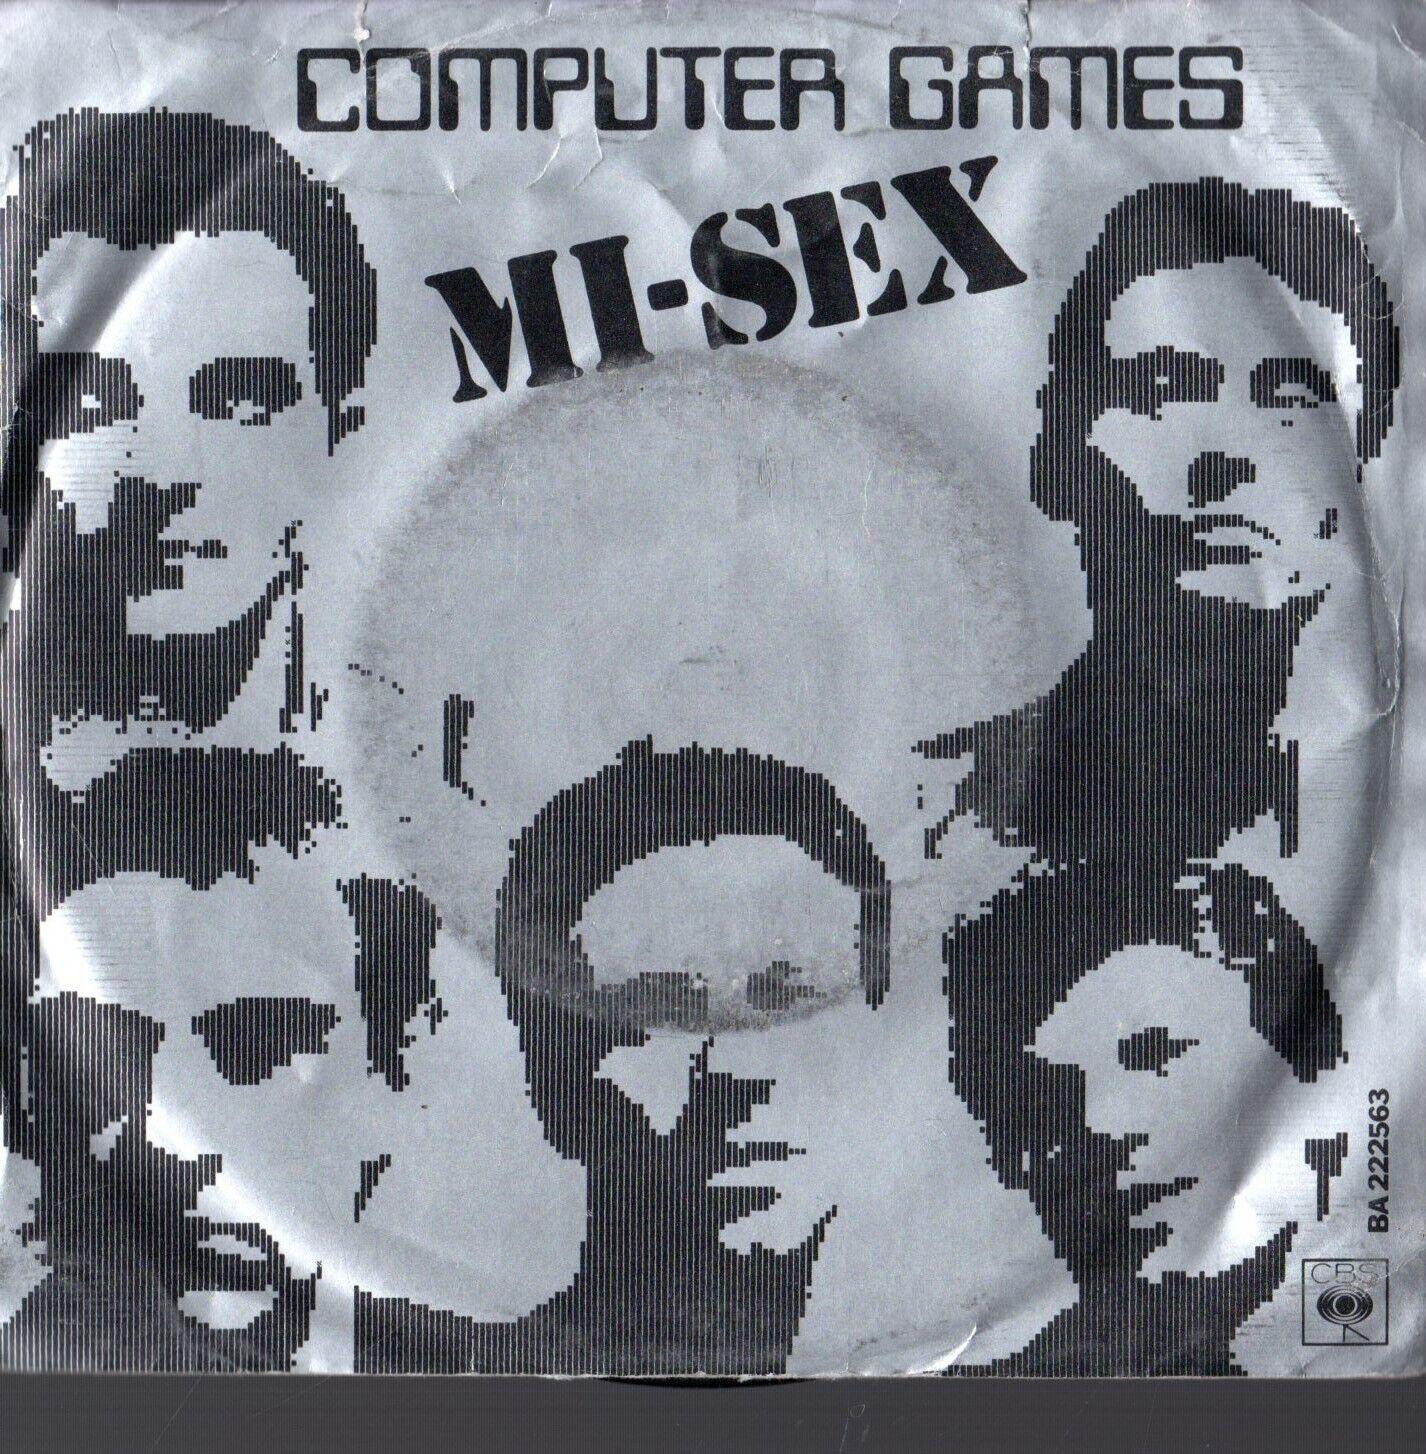 "Computer Games - MI-SEX - COMPUTER GAMES 7"" 45 VINYL RECORD 1987 VGC PICTURE SLEEVE"